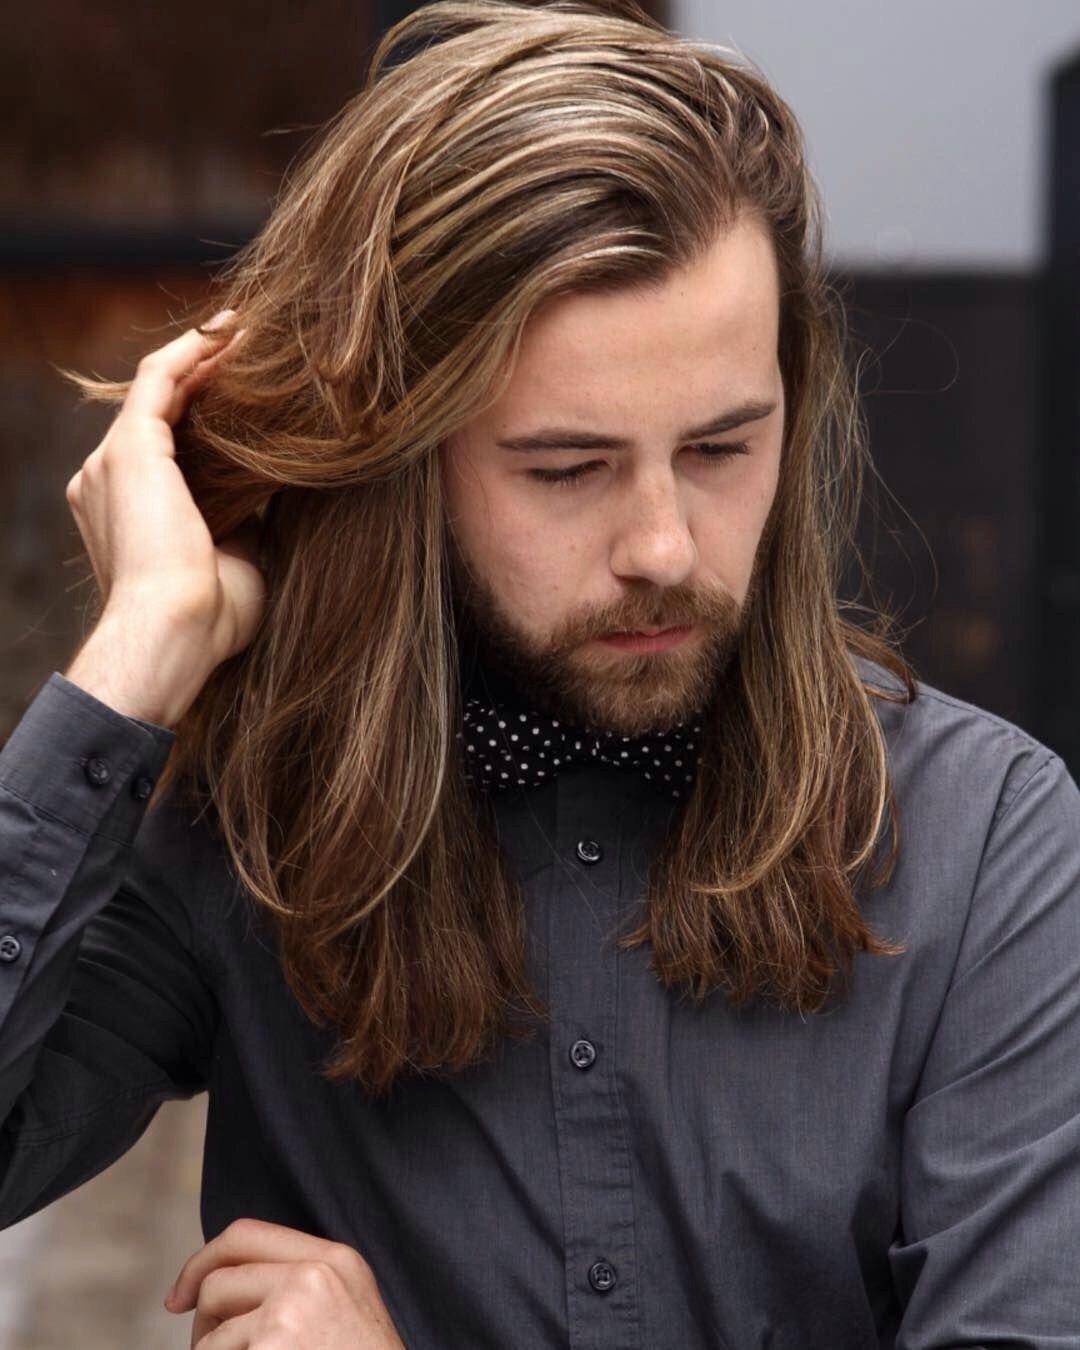 Pin By Noida Irfan On Long Hair Men Long Hair Styles Men Long Hair Beard Medium Length Hair Men